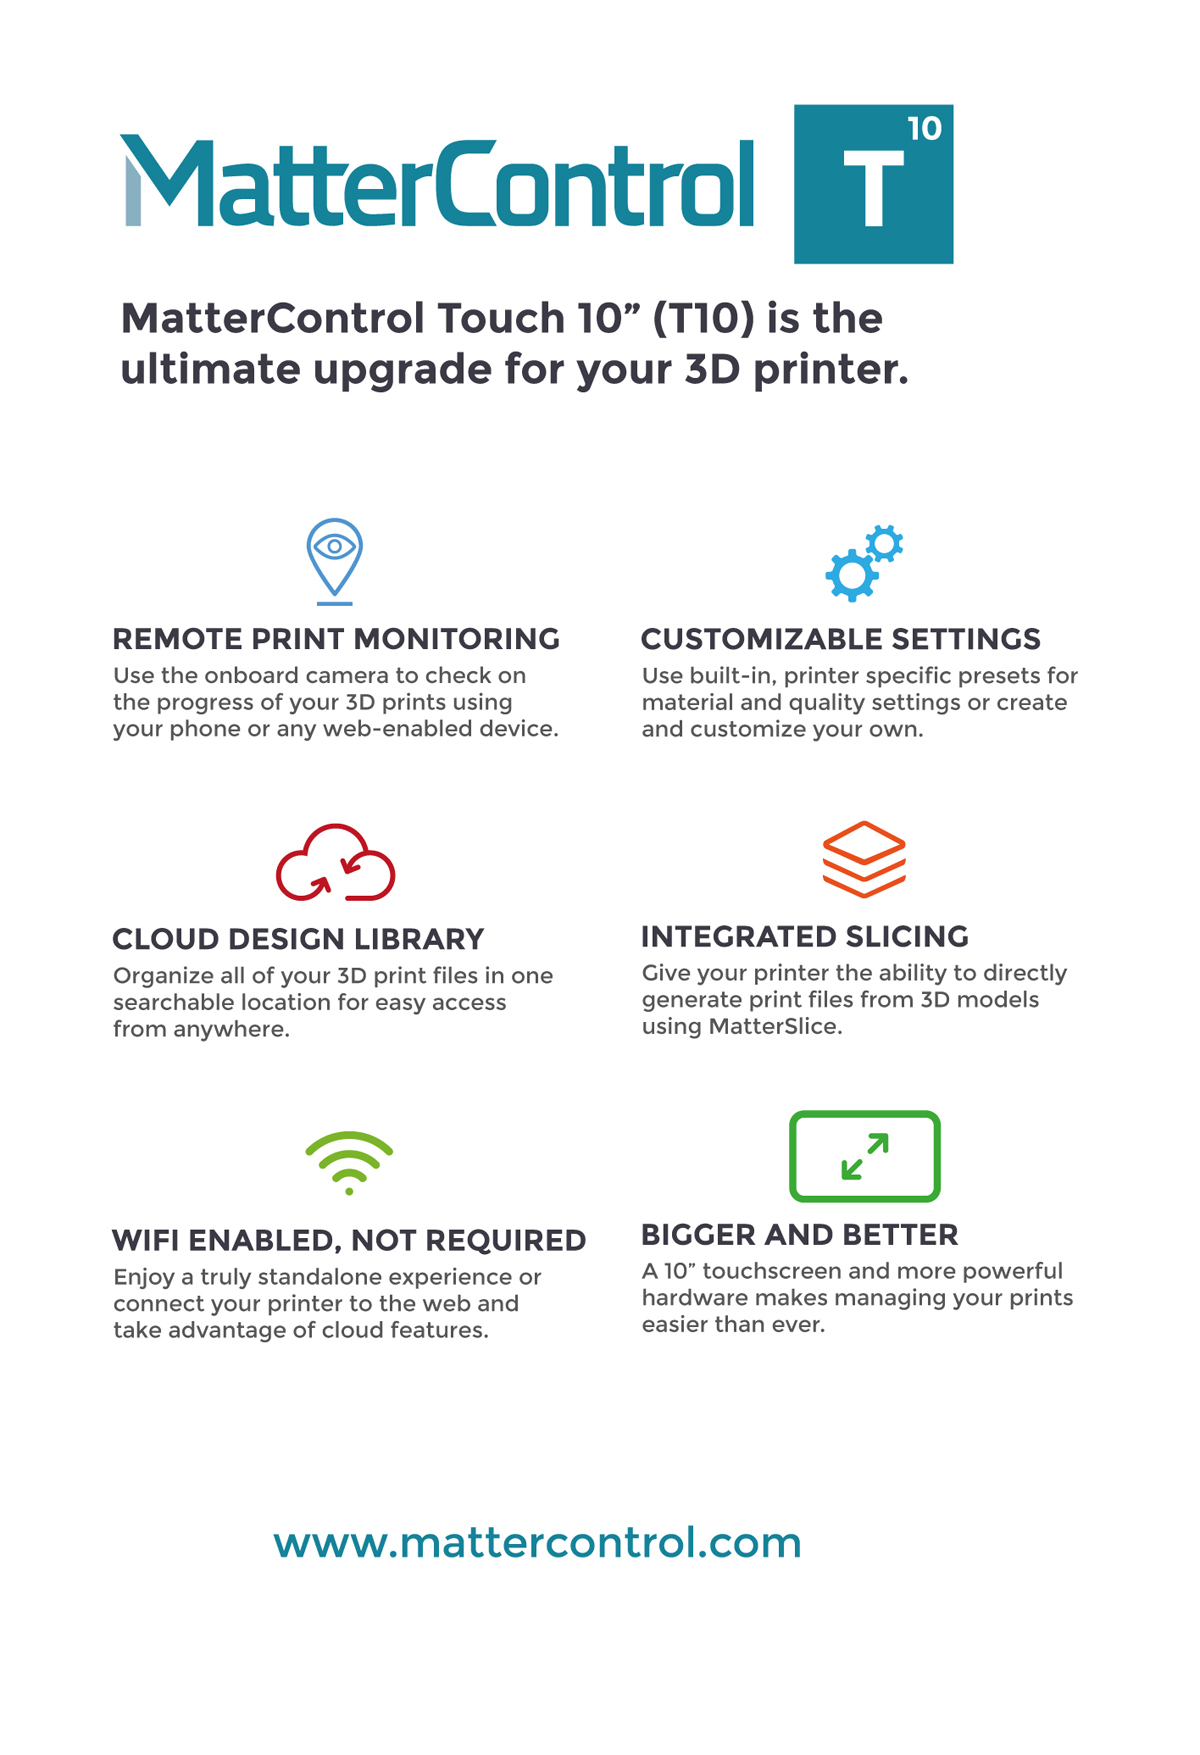 mattercontrol t10 3D printing platform from matter hackers features